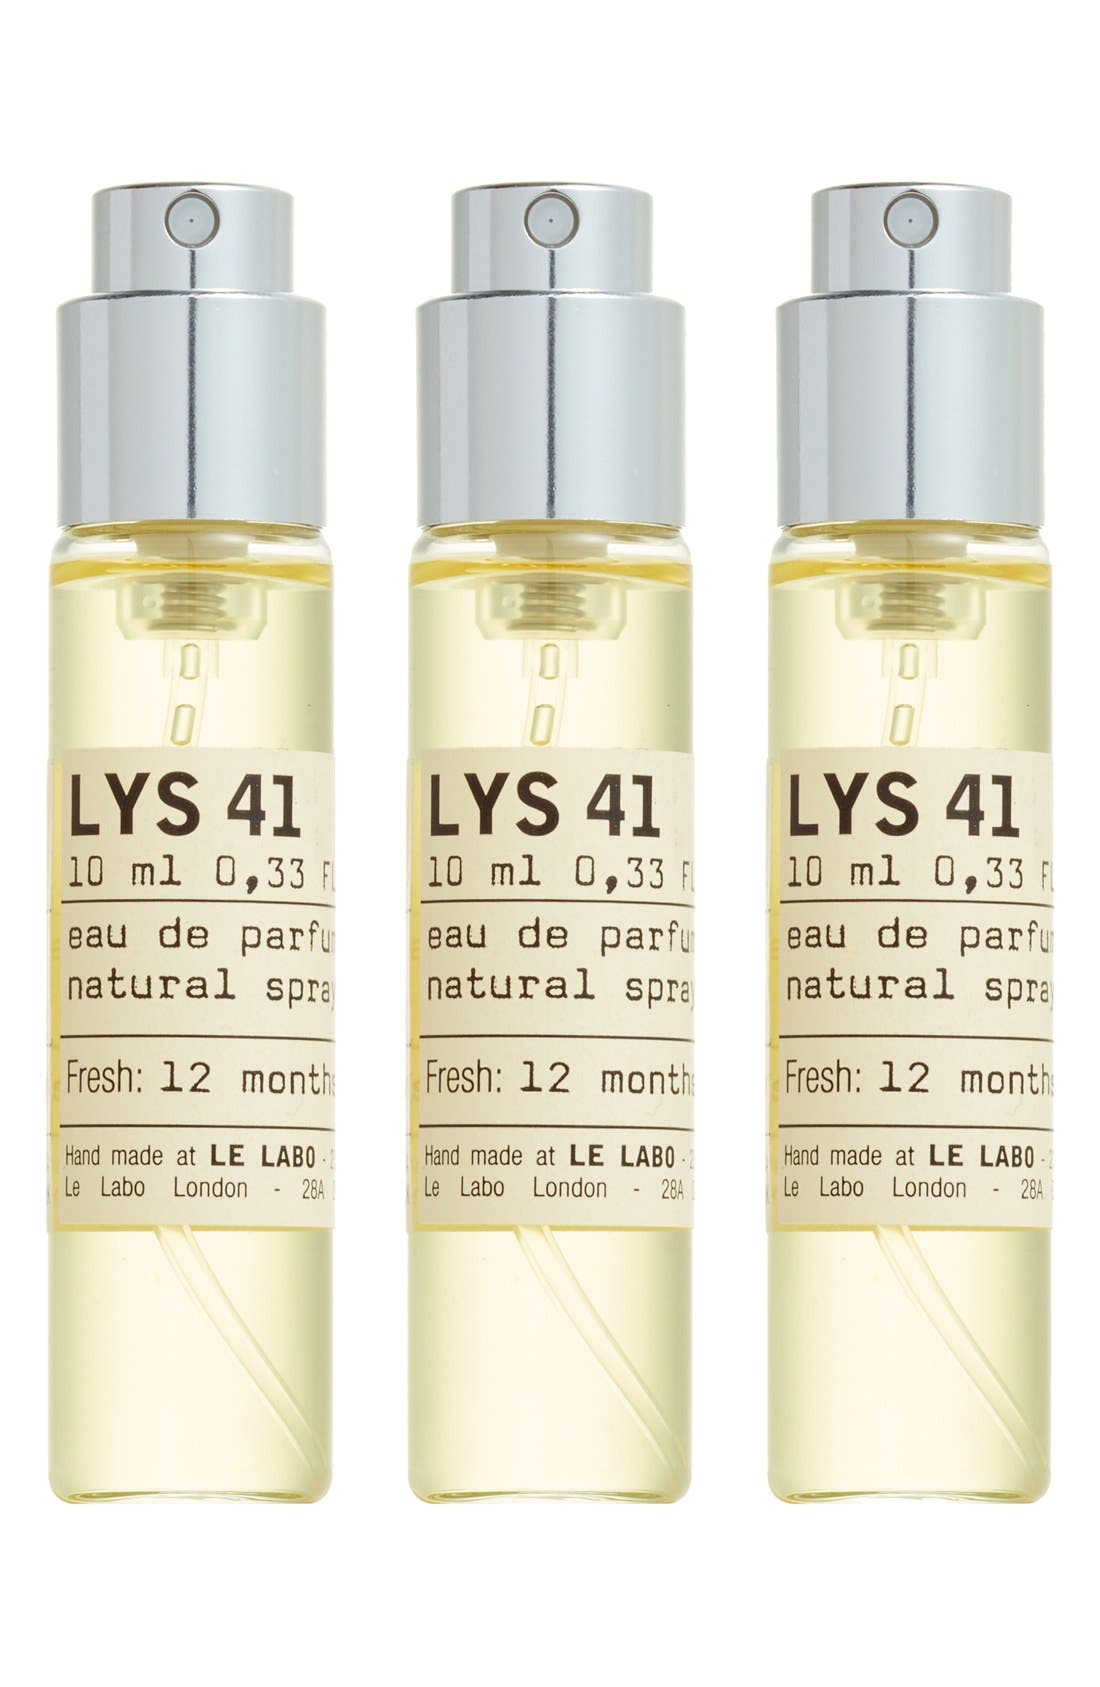 Le Labo 'Lys 41' Travel Tube Refill